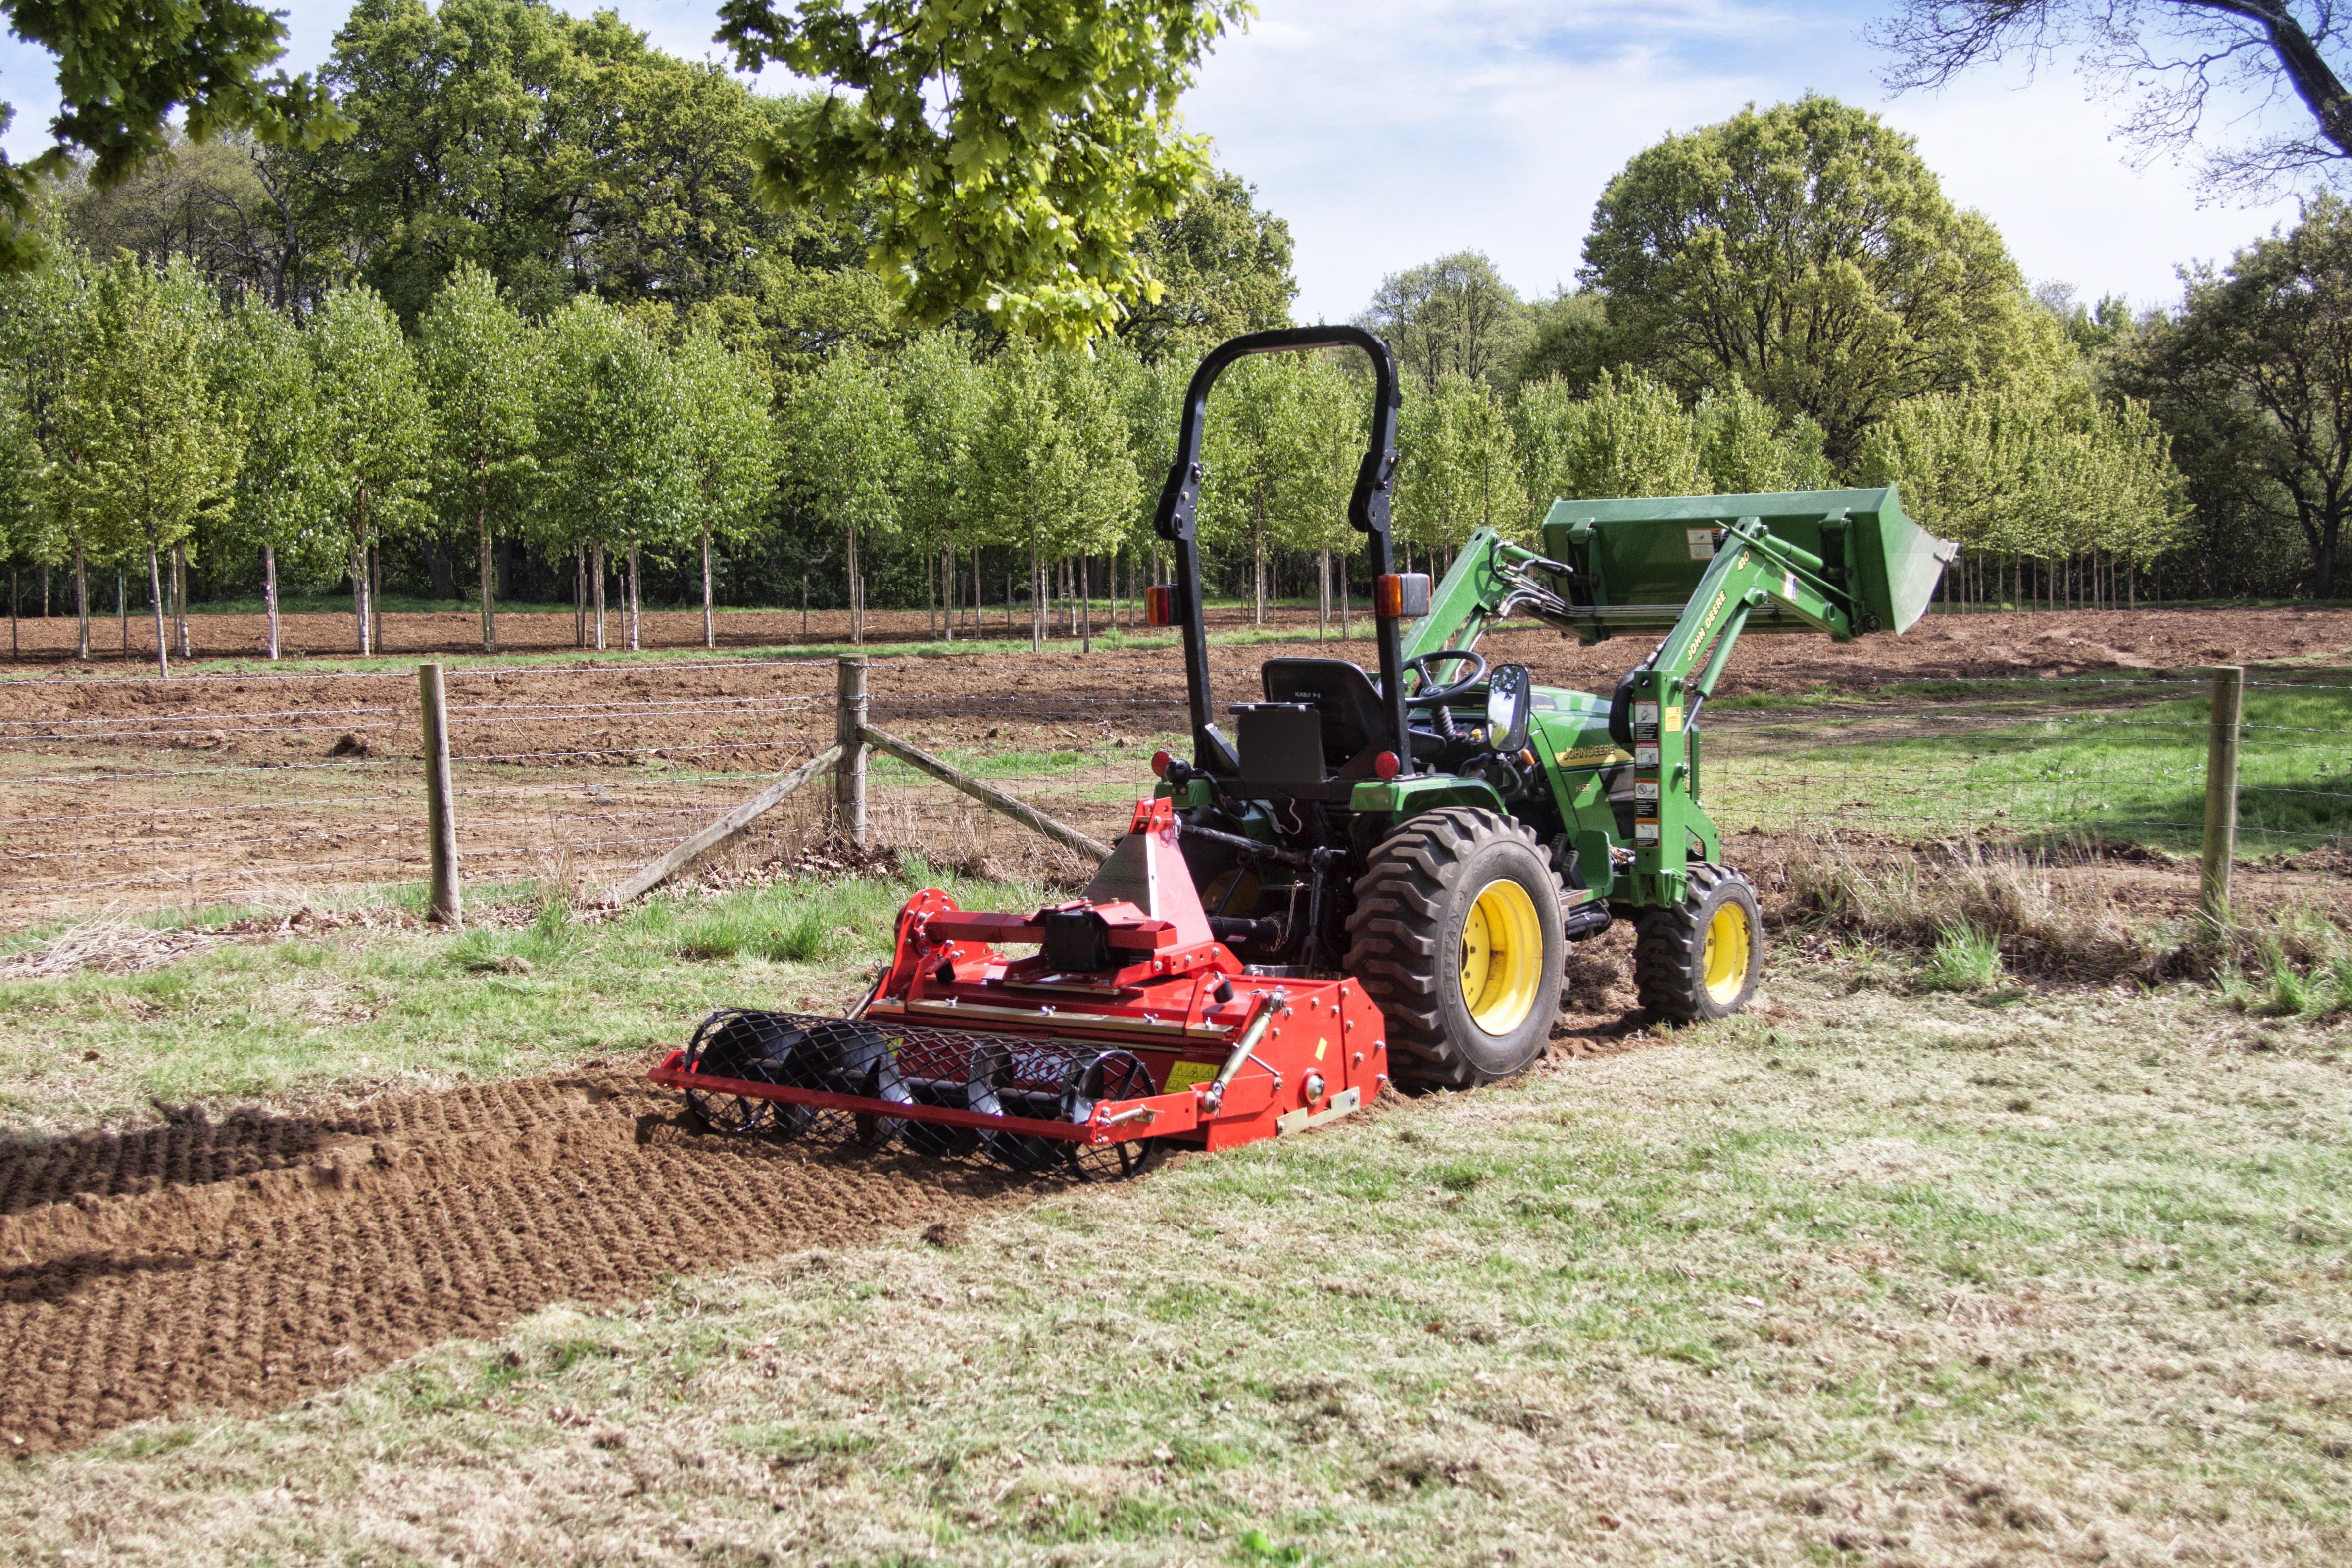 Groundcare machinery